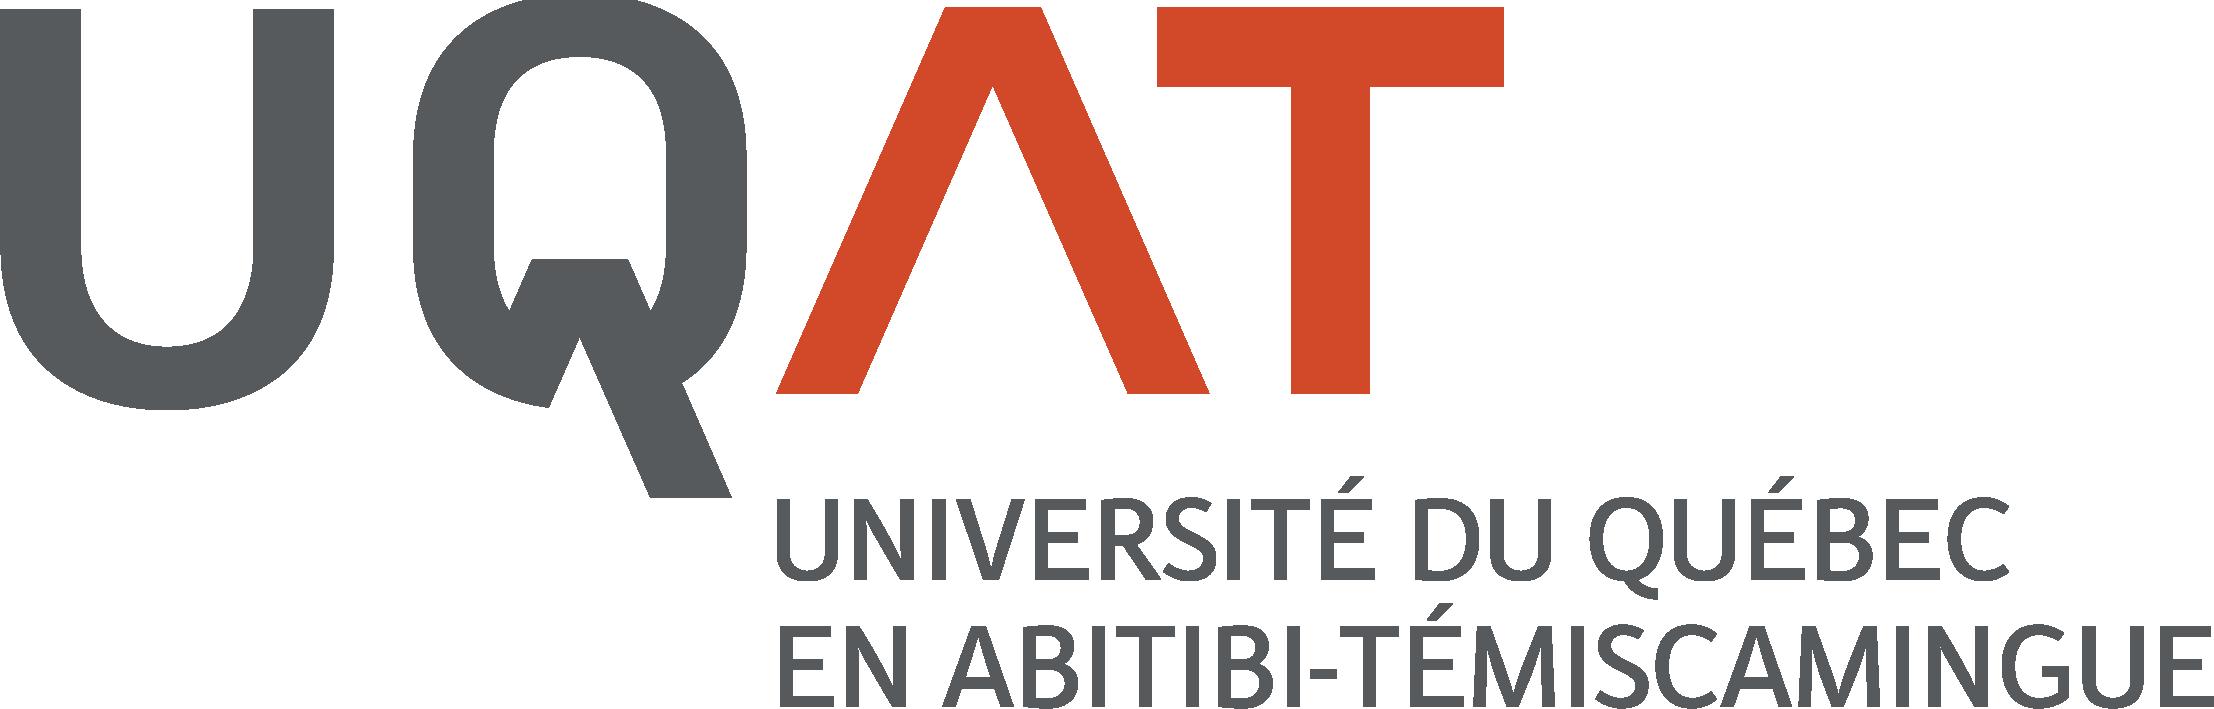 Université du Québec en Abitibi-Témiscamingue